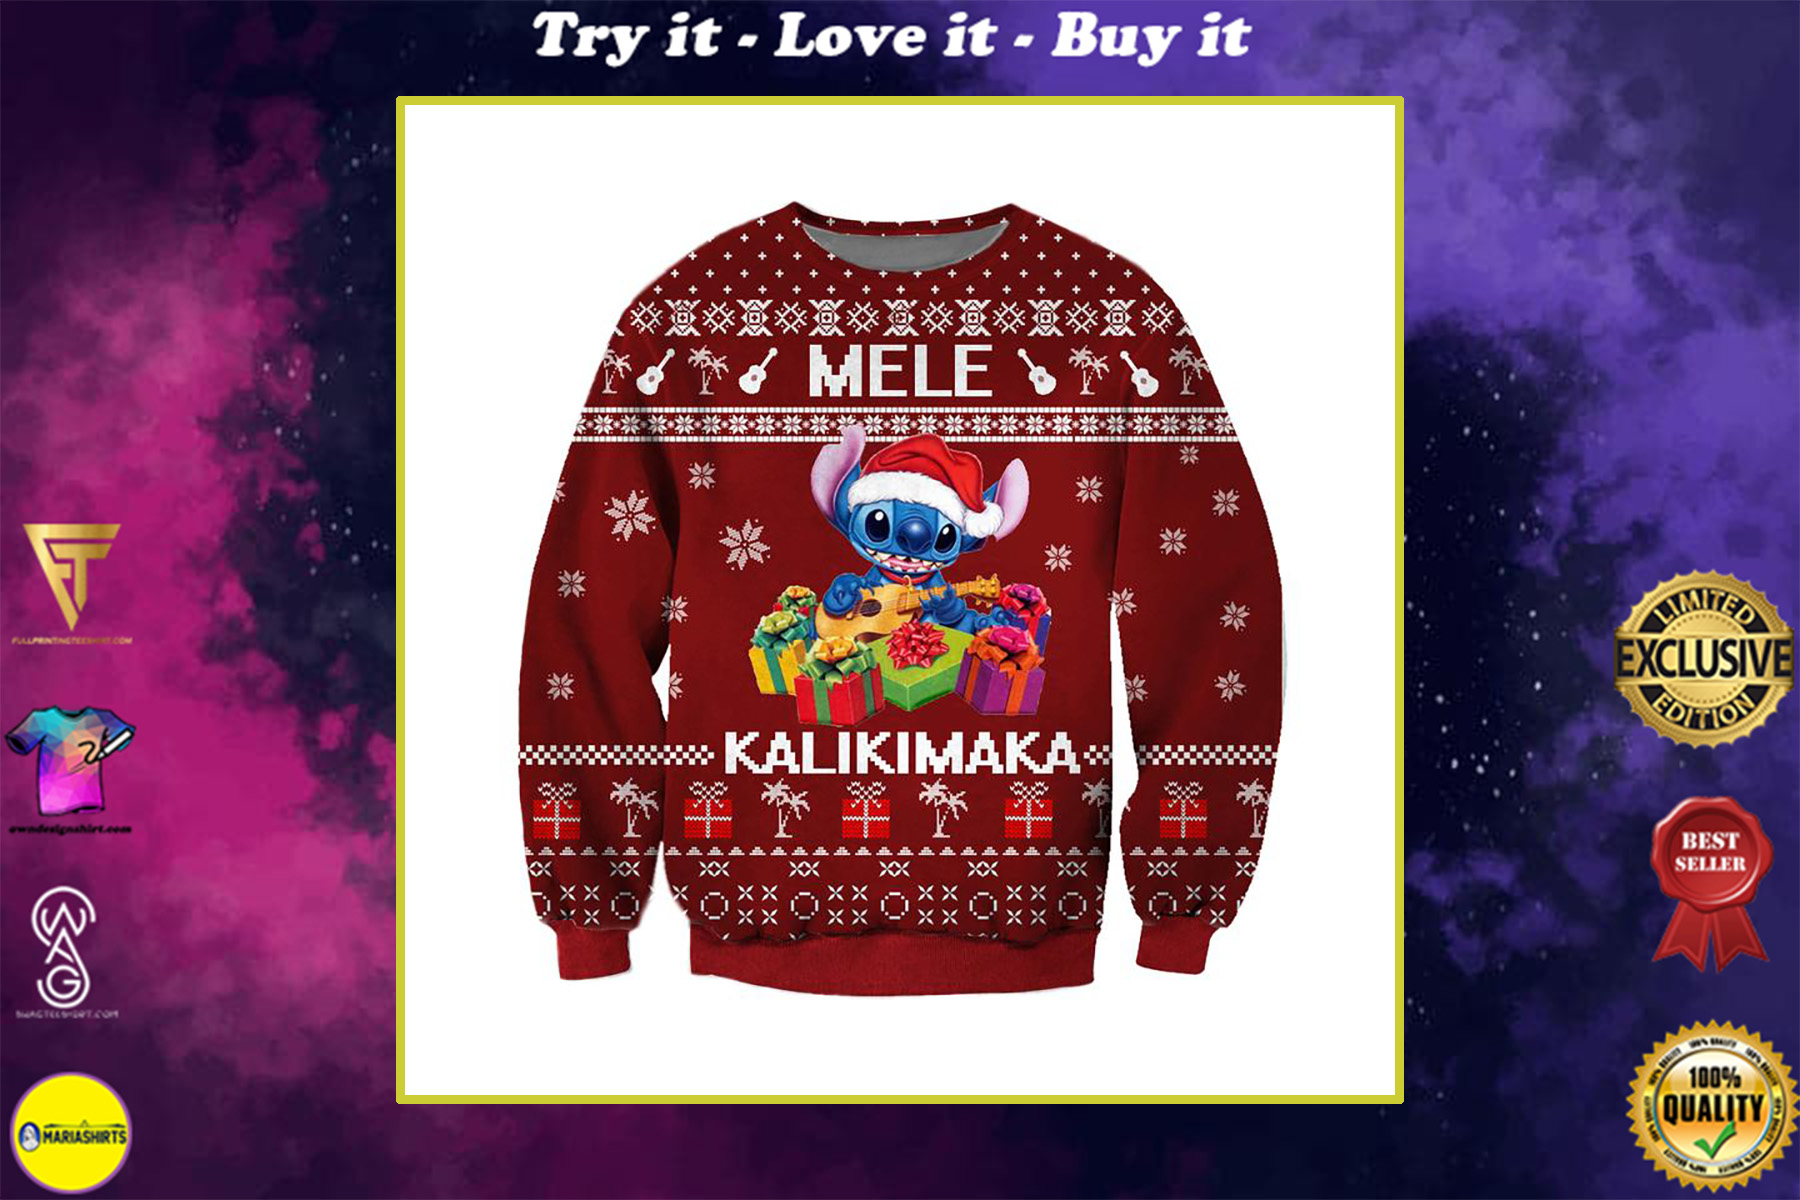 mele kalikimaka stitch santa claus all over printed ugly christmas sweater